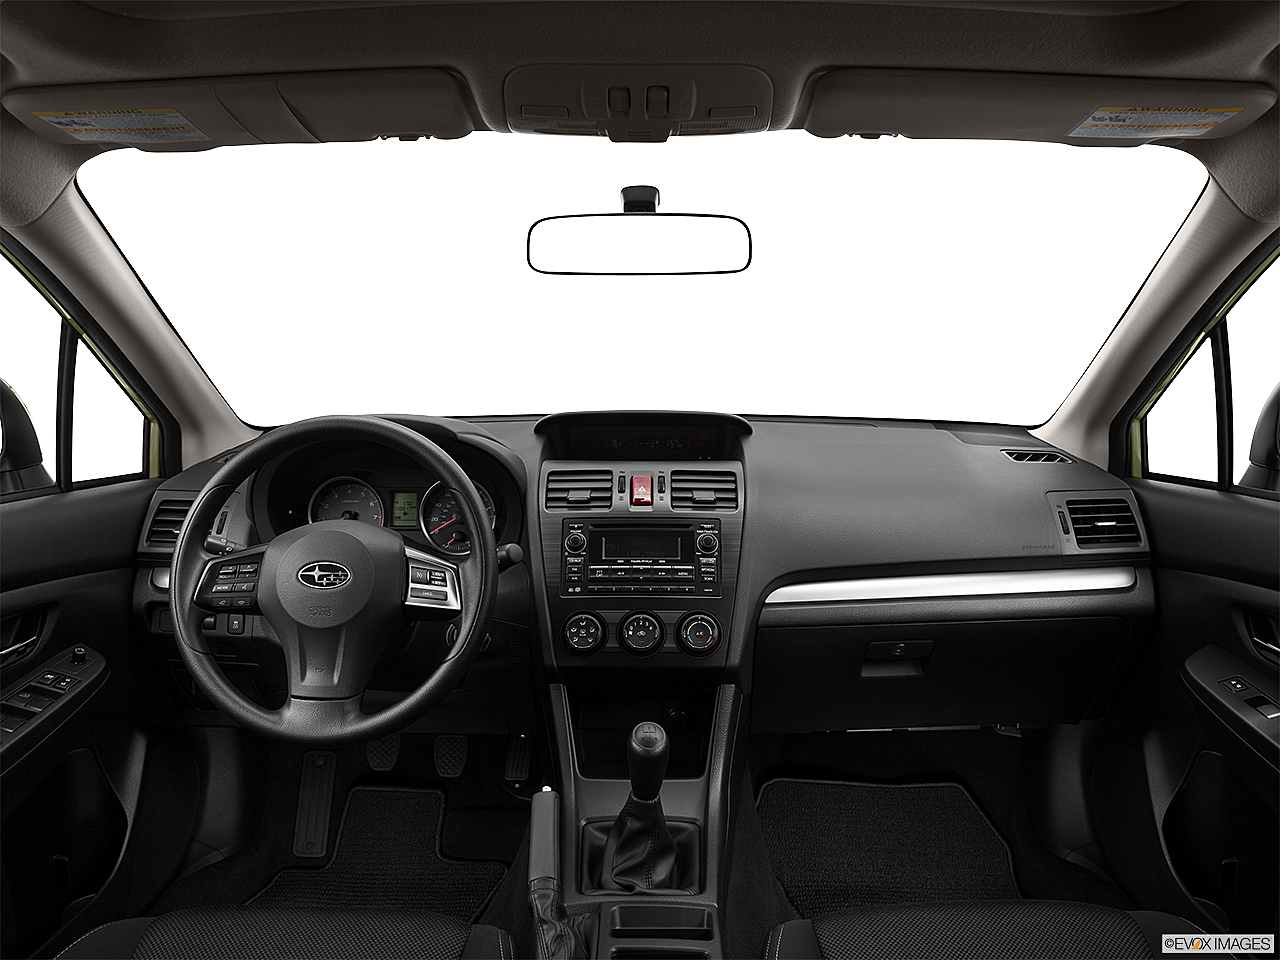 2013 Subaru Xv Crosstrek Awd 2 0i Premium 4dr Crossover 5m